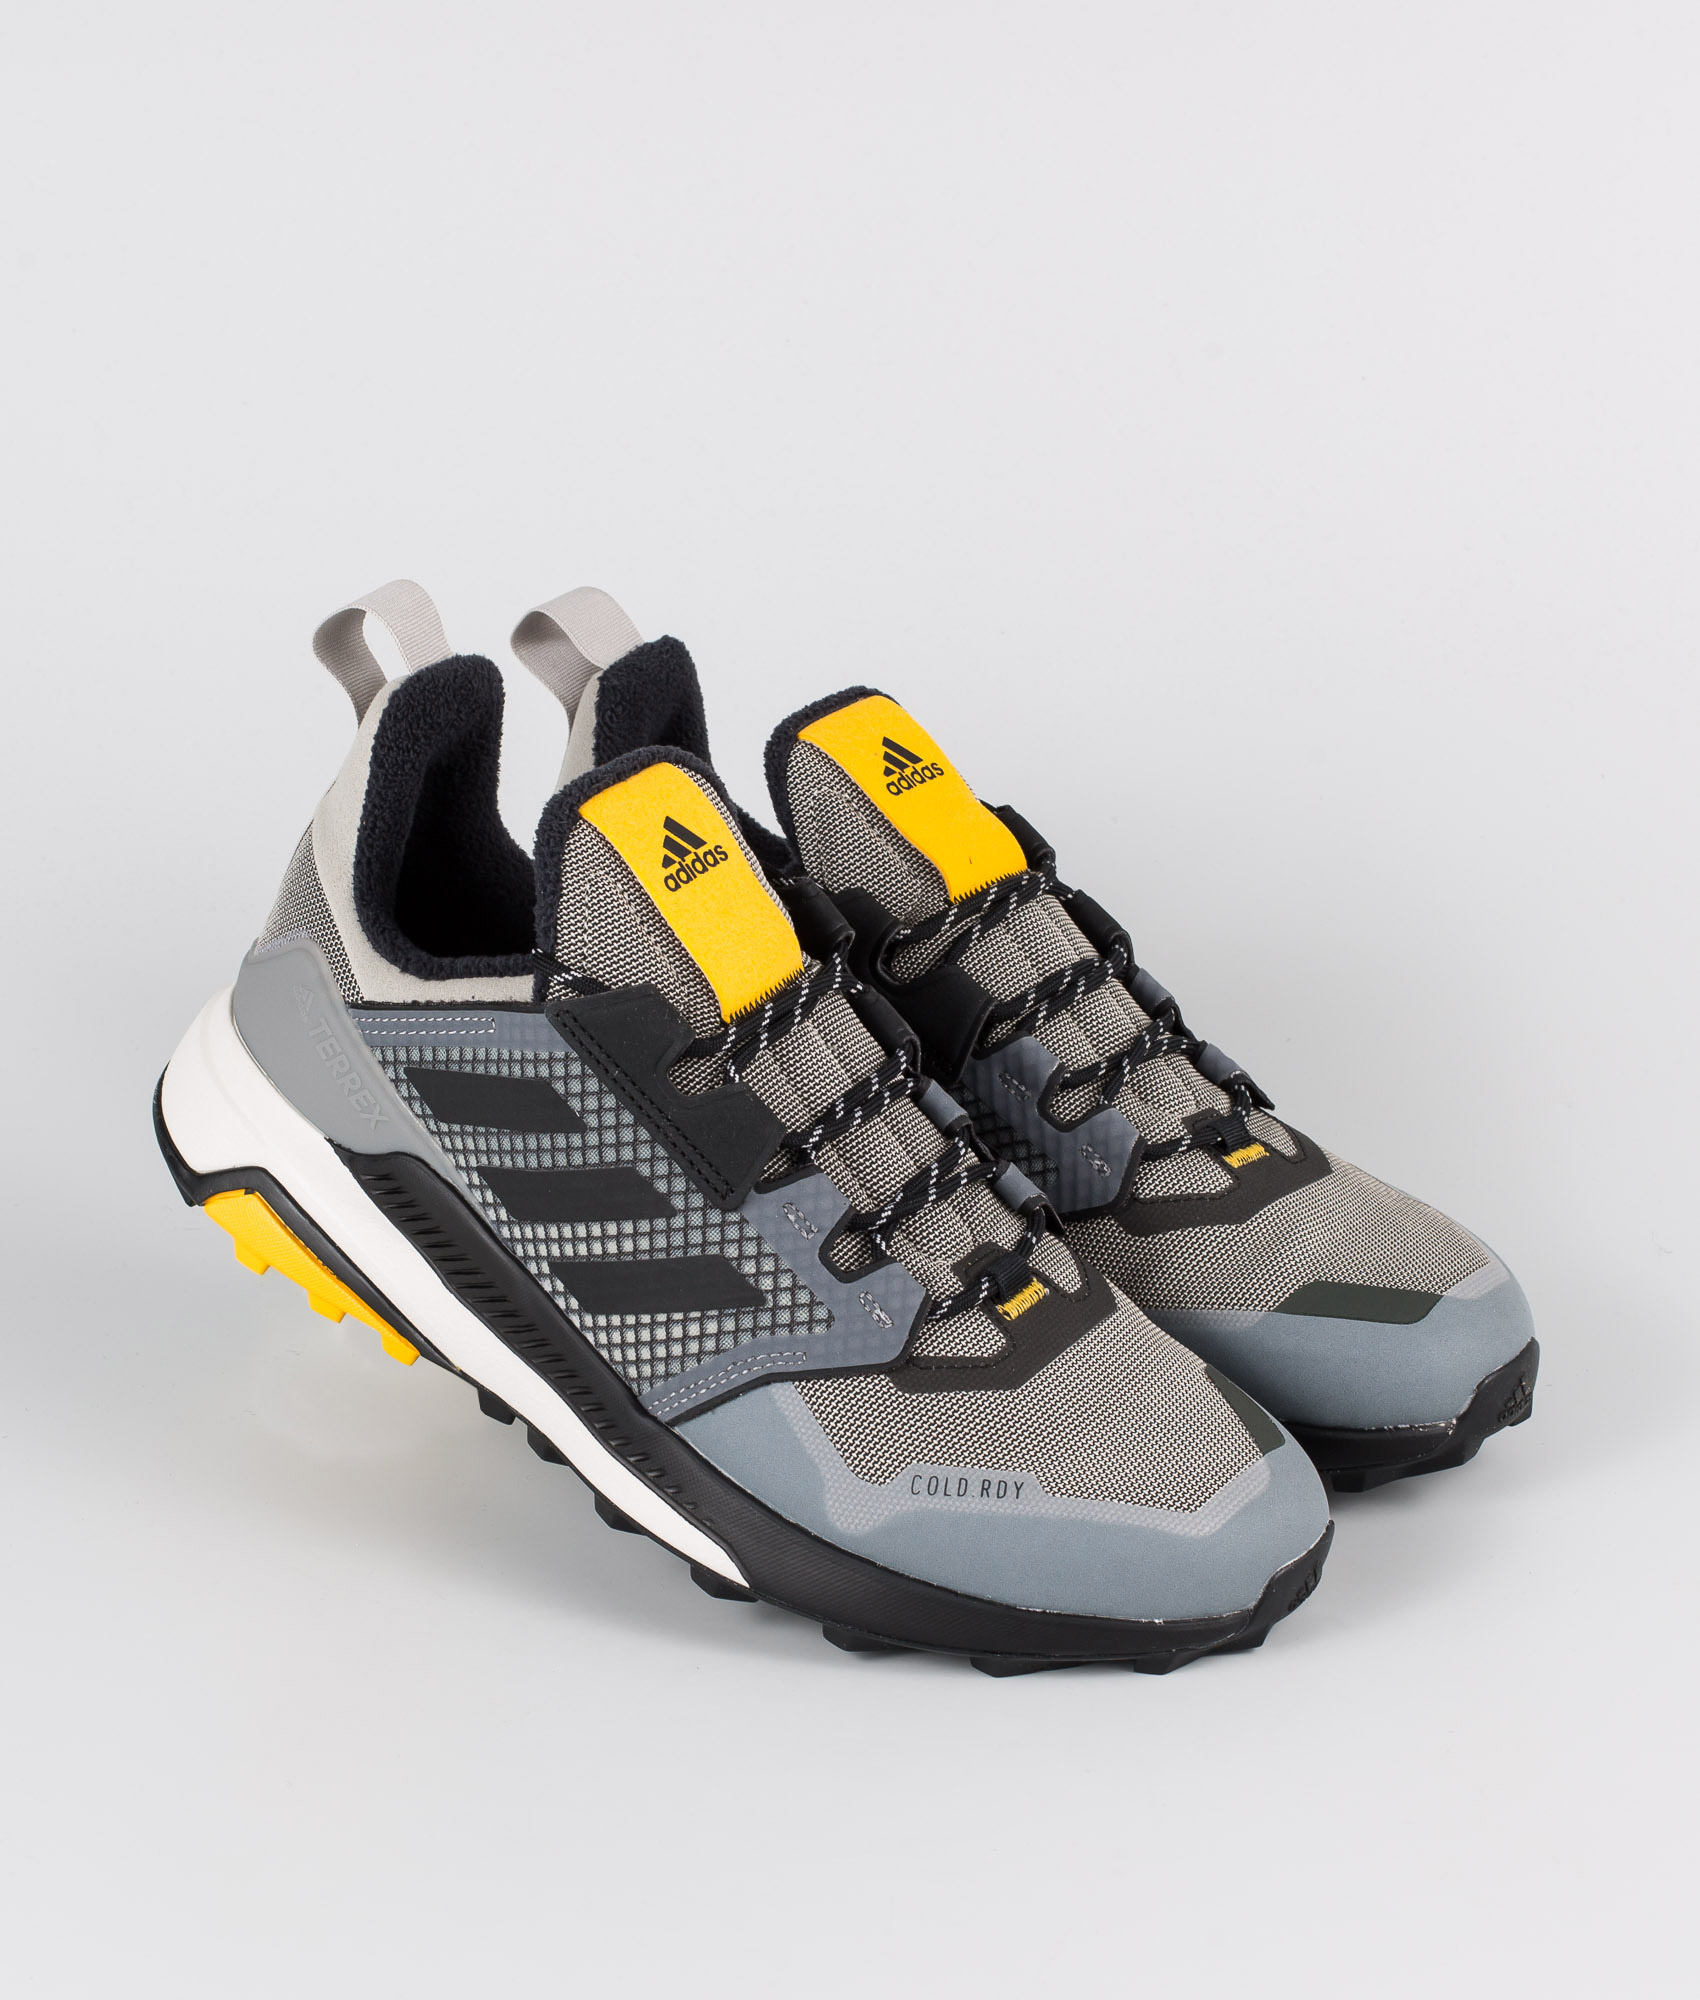 Adidas Terrex Terrex Trailmaker C.RDY